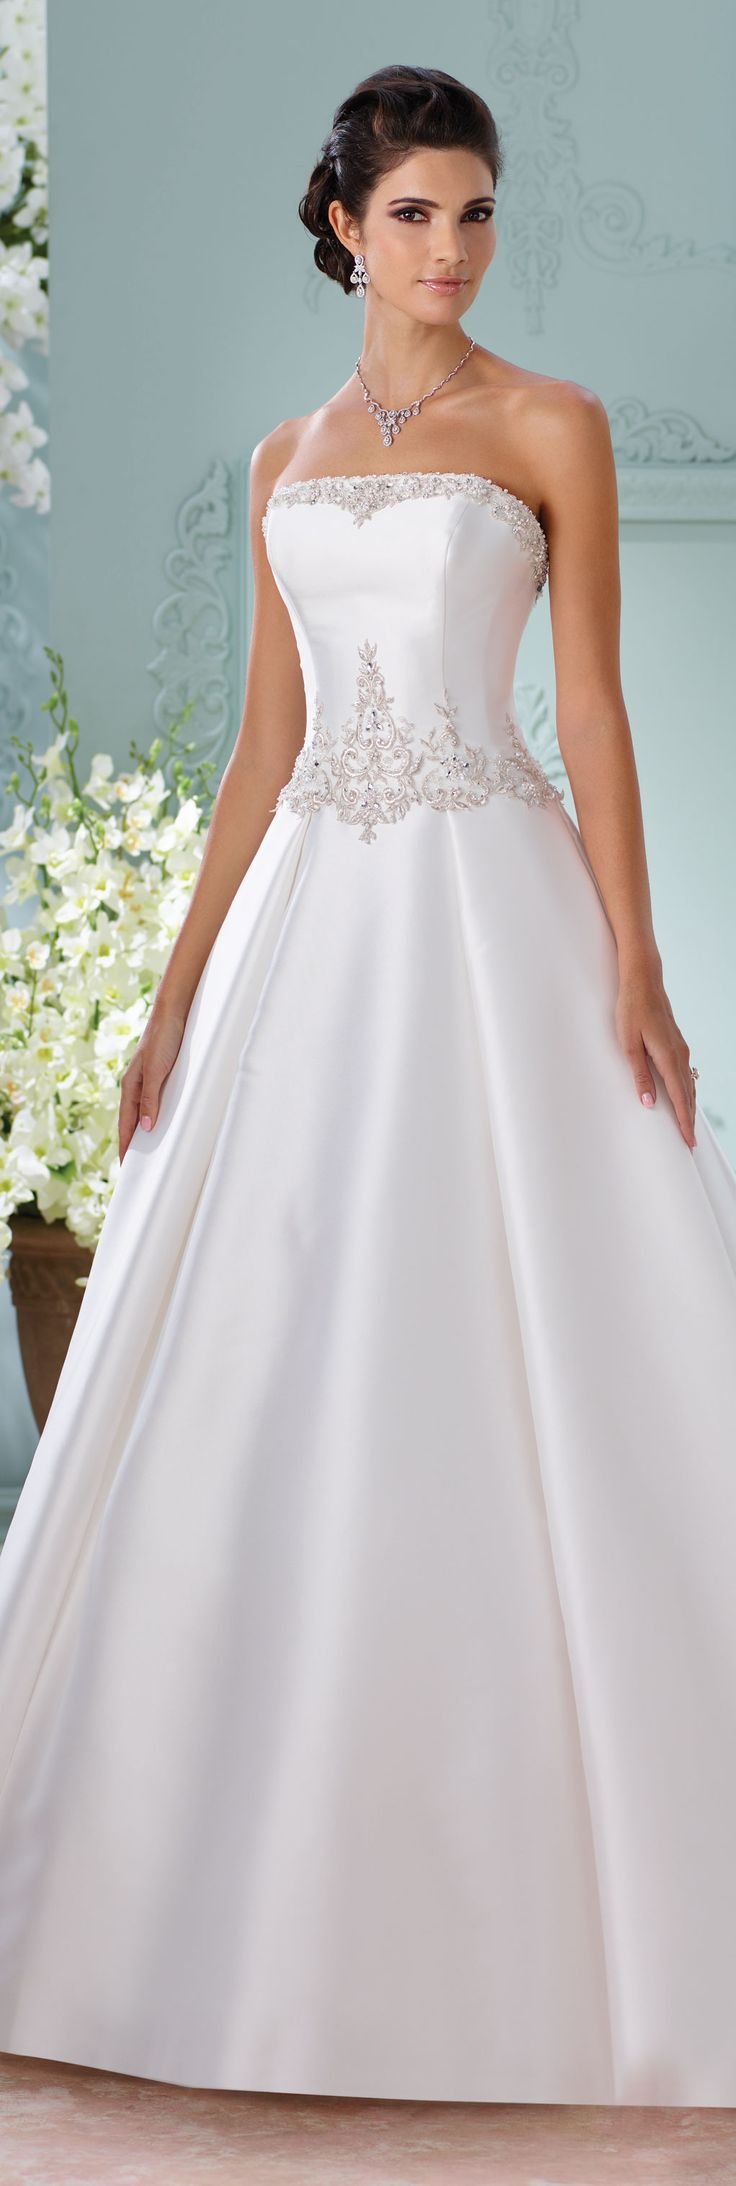 The David Tutera for Mon Cheri Spring 2016 Wedding Gown Collection - Style No. 116223 Selena #satinweddingdress